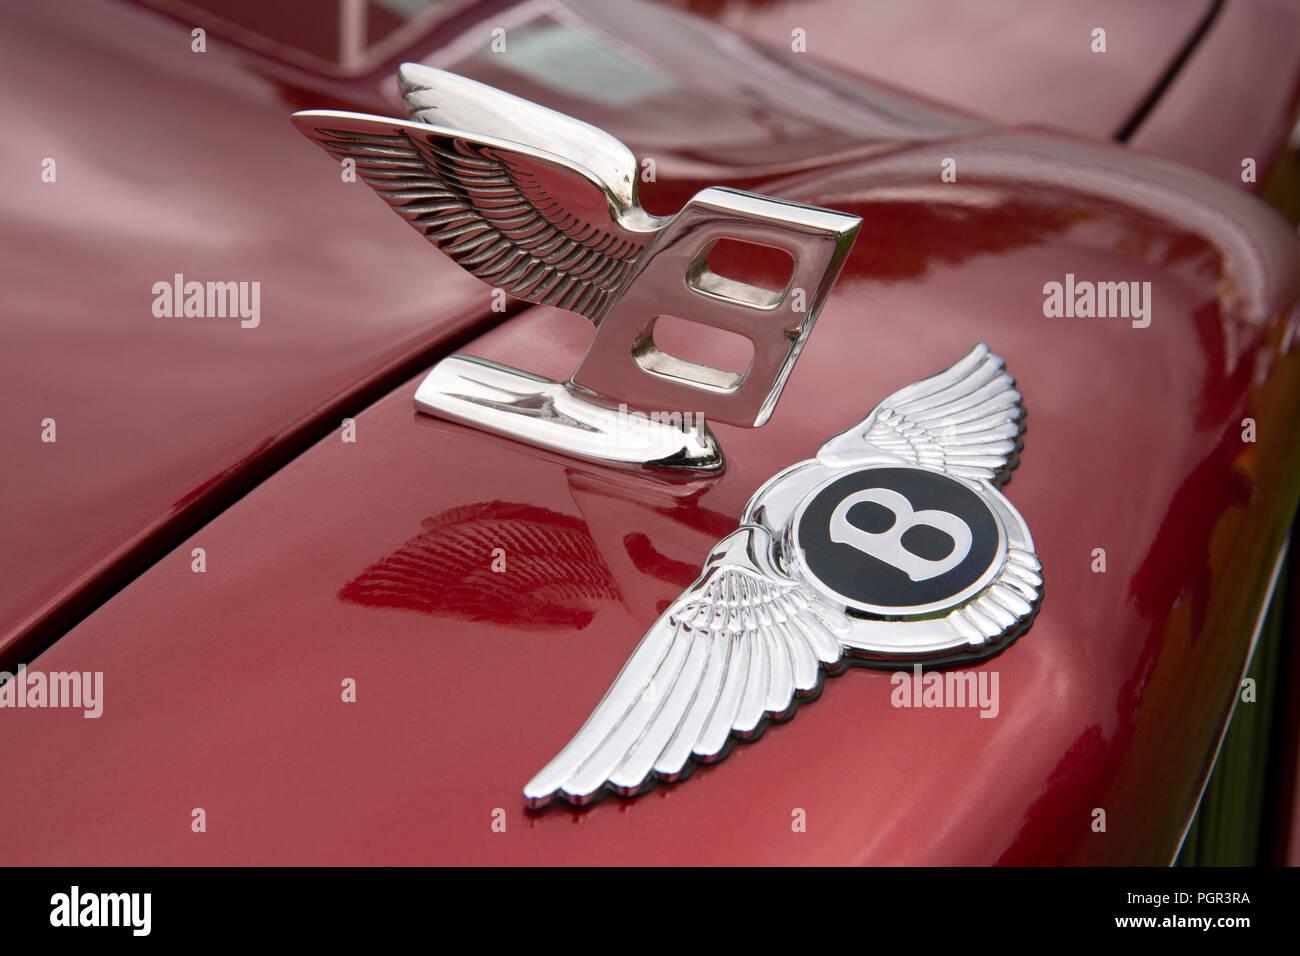 UK, England, Cheshire, Stockport, Woodsmoor Car Show, flying B badges on radiator of 2000 Bentley Arnage saloon car Stock Photo